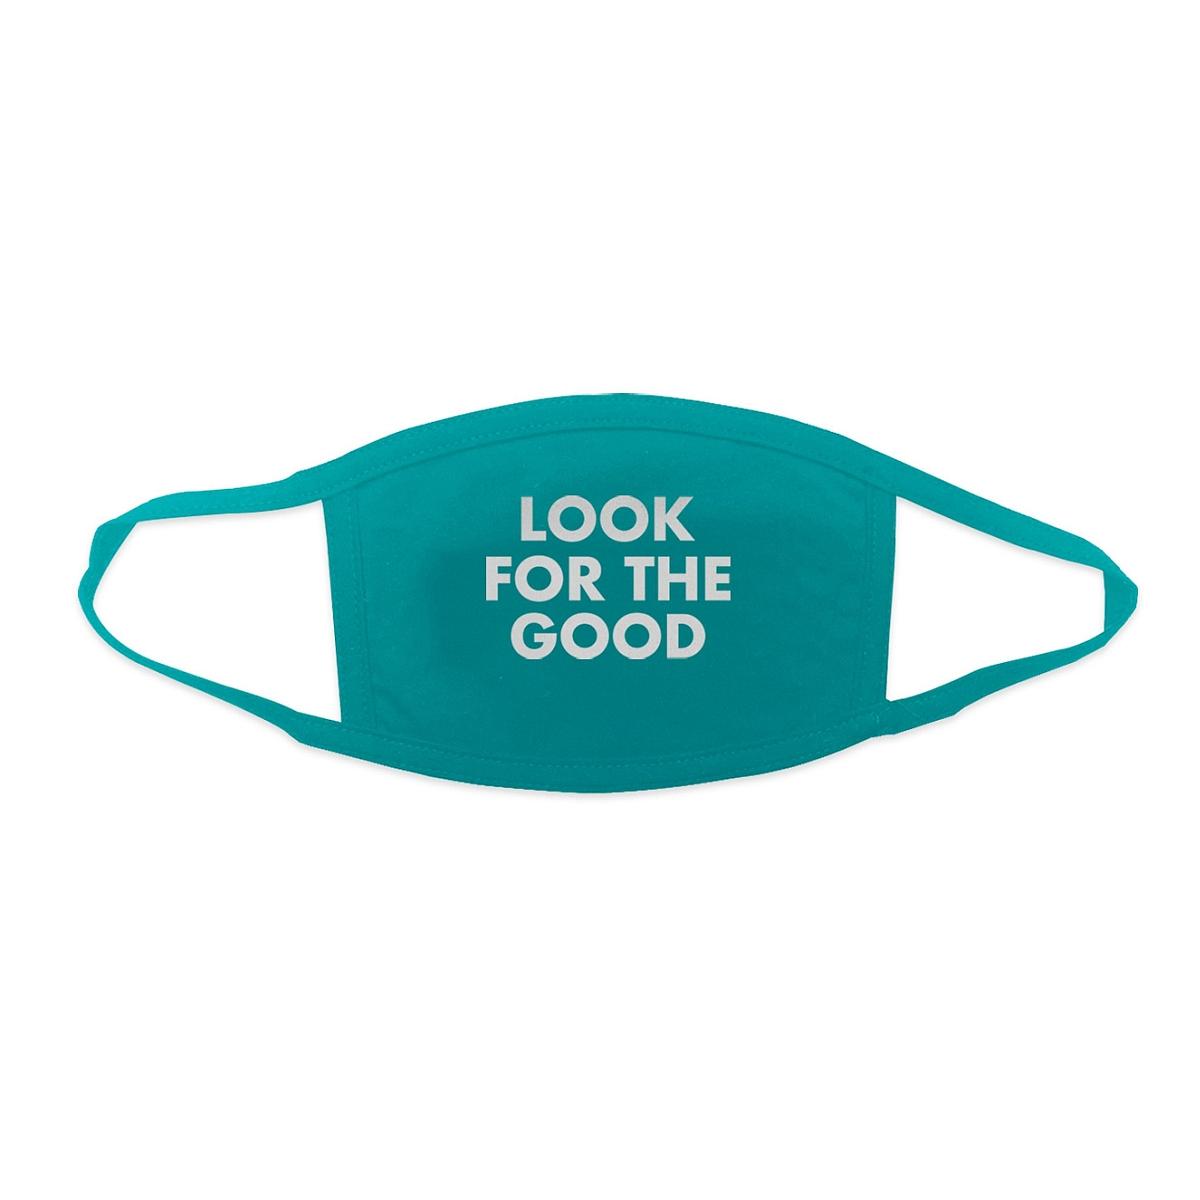 Jason Mraz Look For the Good Face Mask - Turquoise